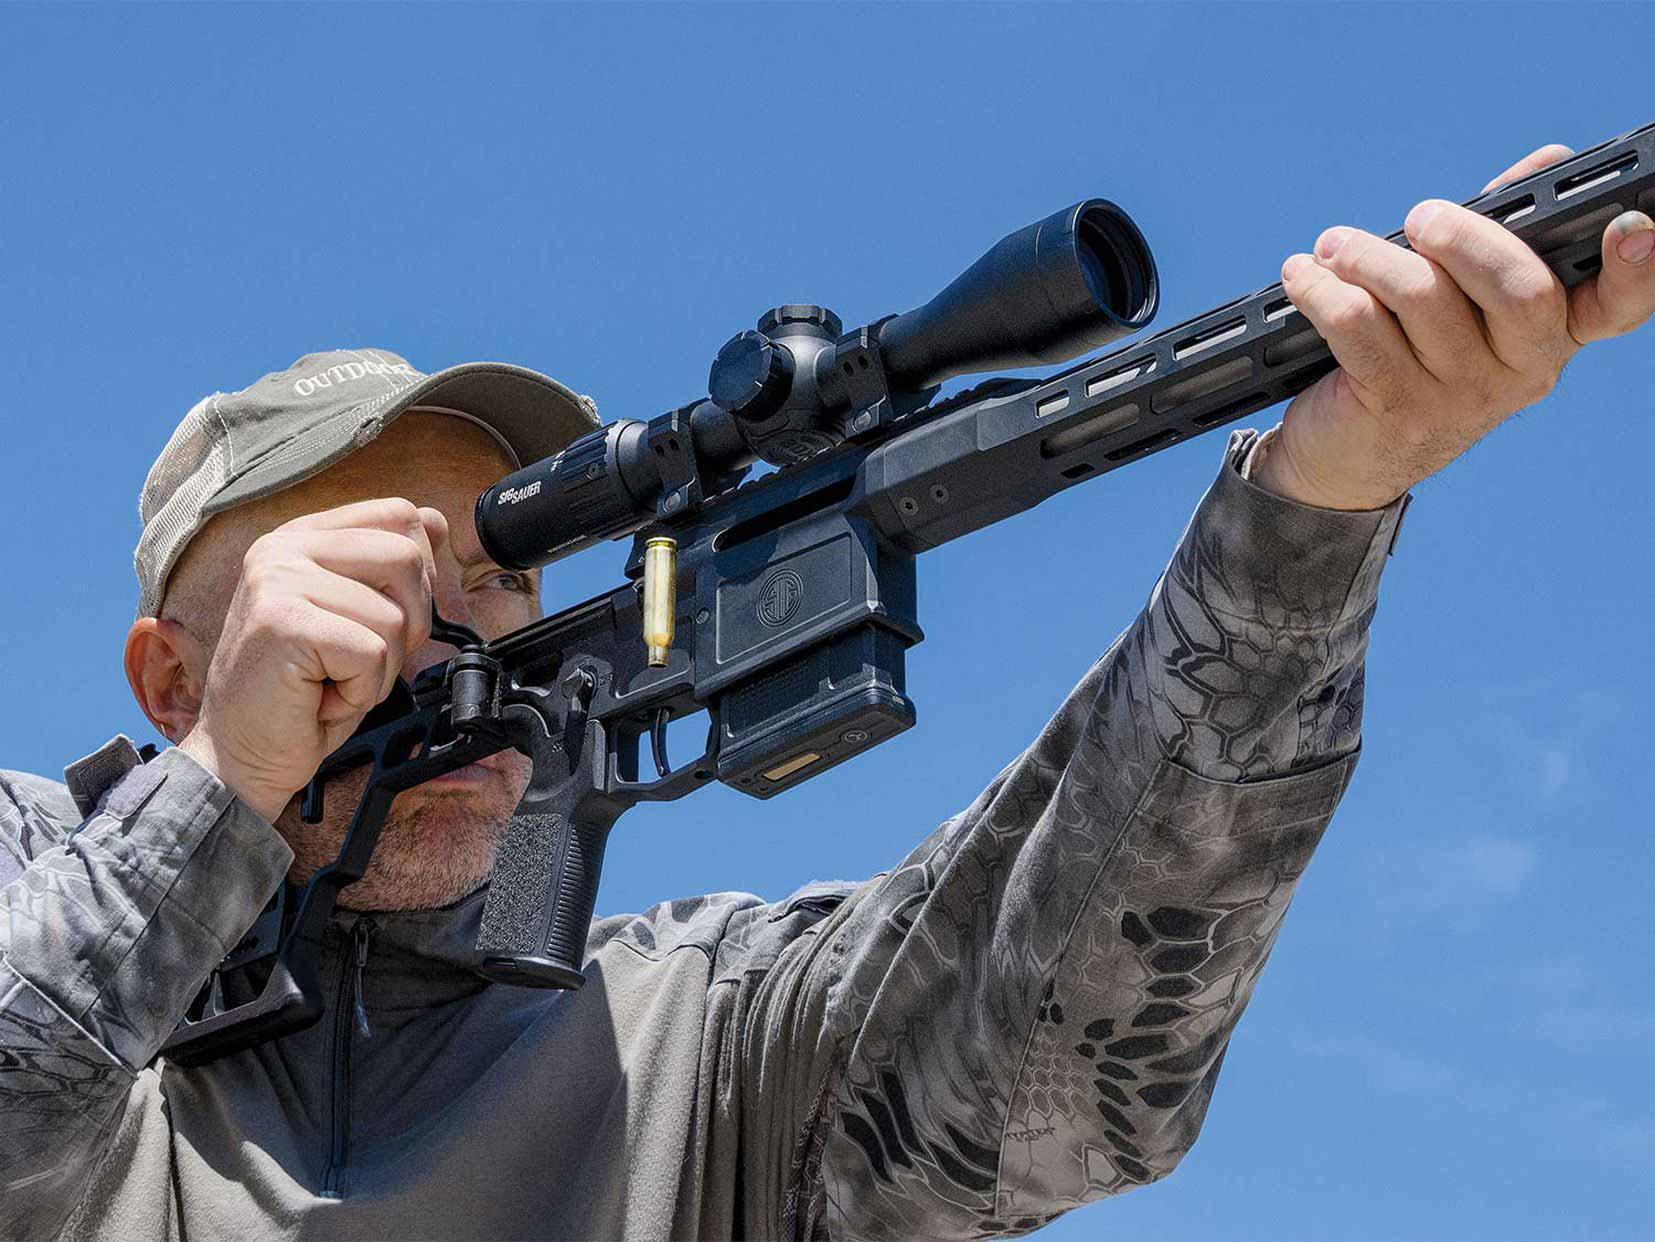 Man using a SIG Cross Rifle